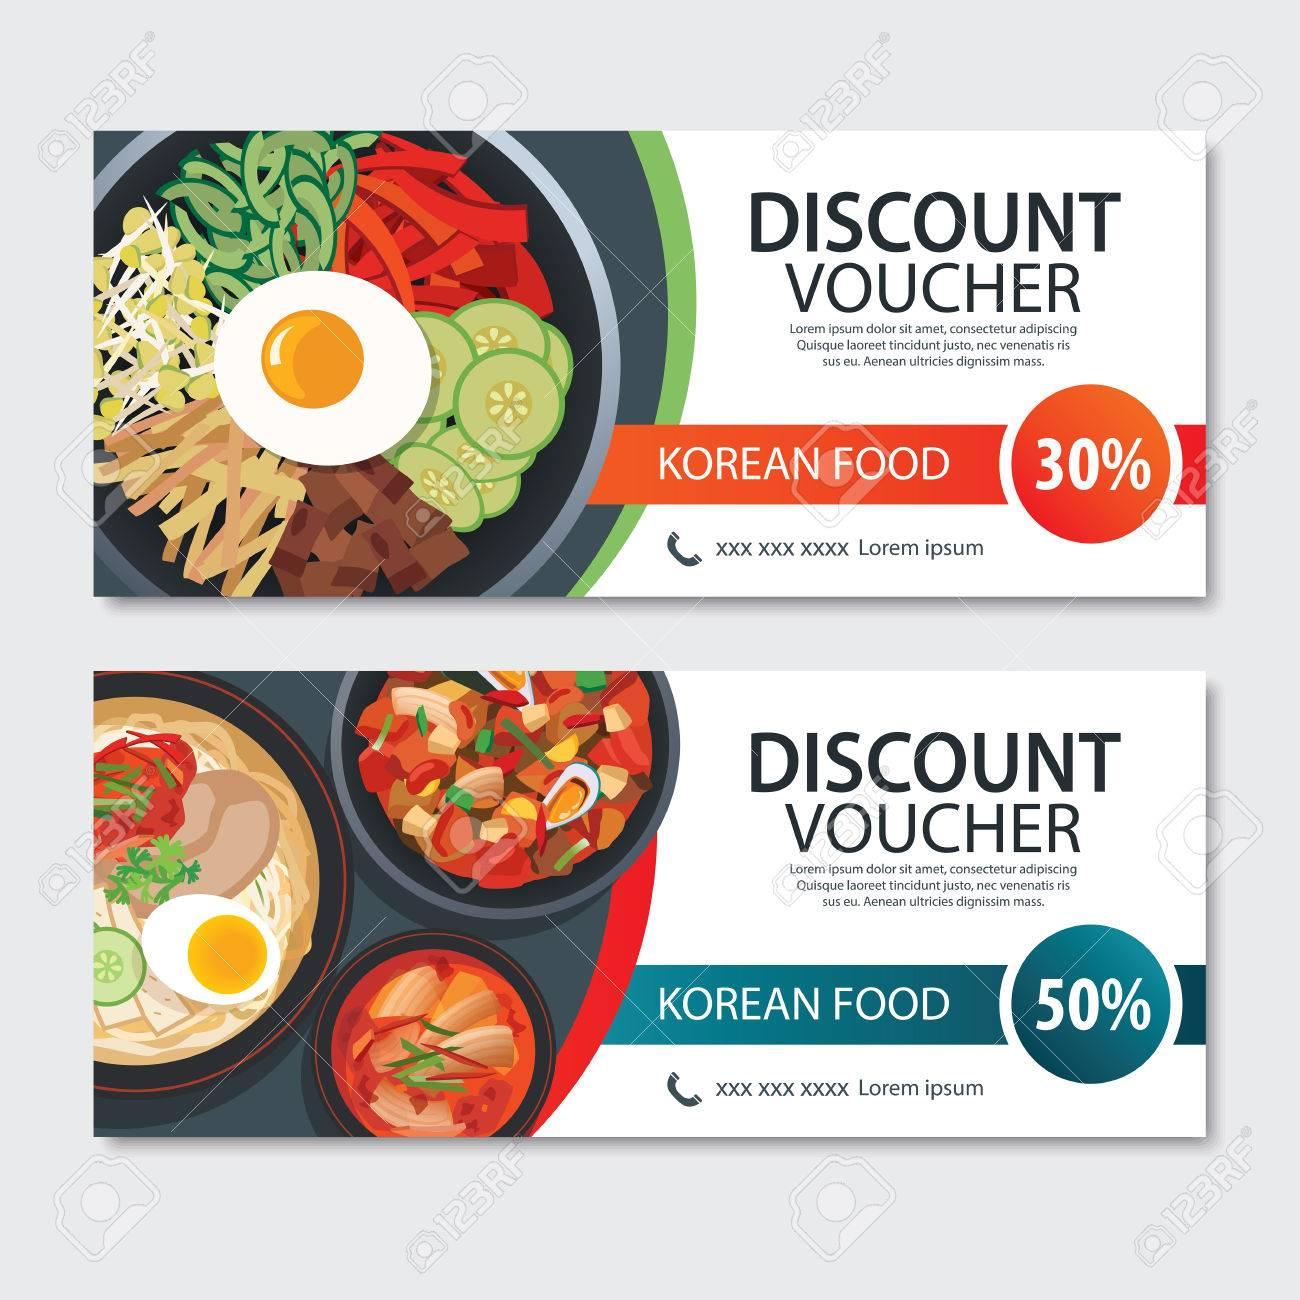 Discount Voucher Asian Food Template Design Korean Set Royalty Free